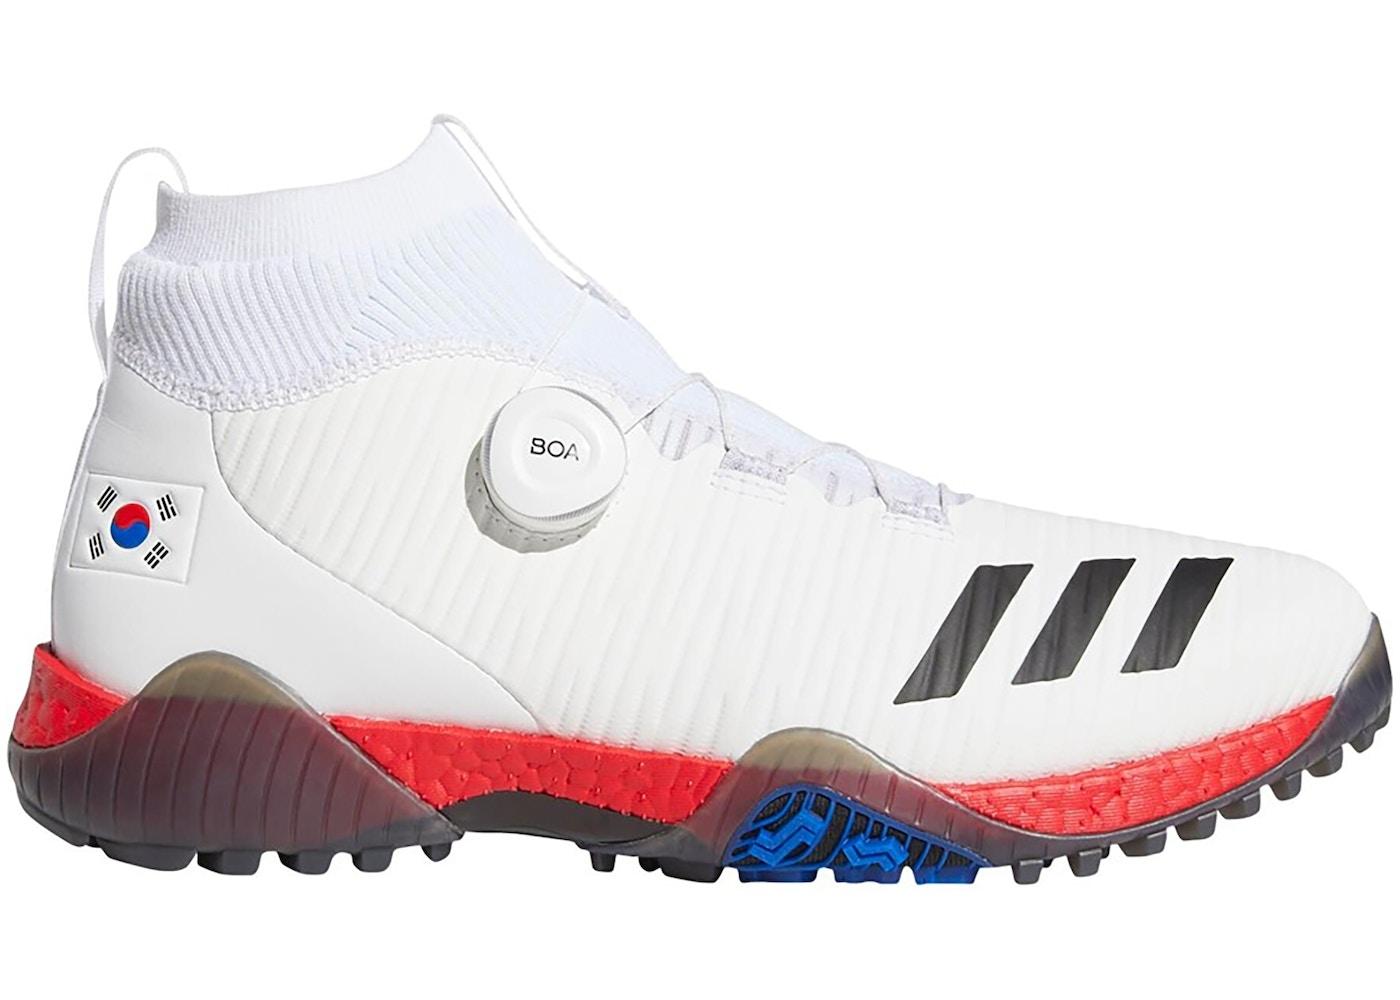 Sabato furto inflazione  adidas CodeChaos BOA Nations Pack South Korea - Sneakers